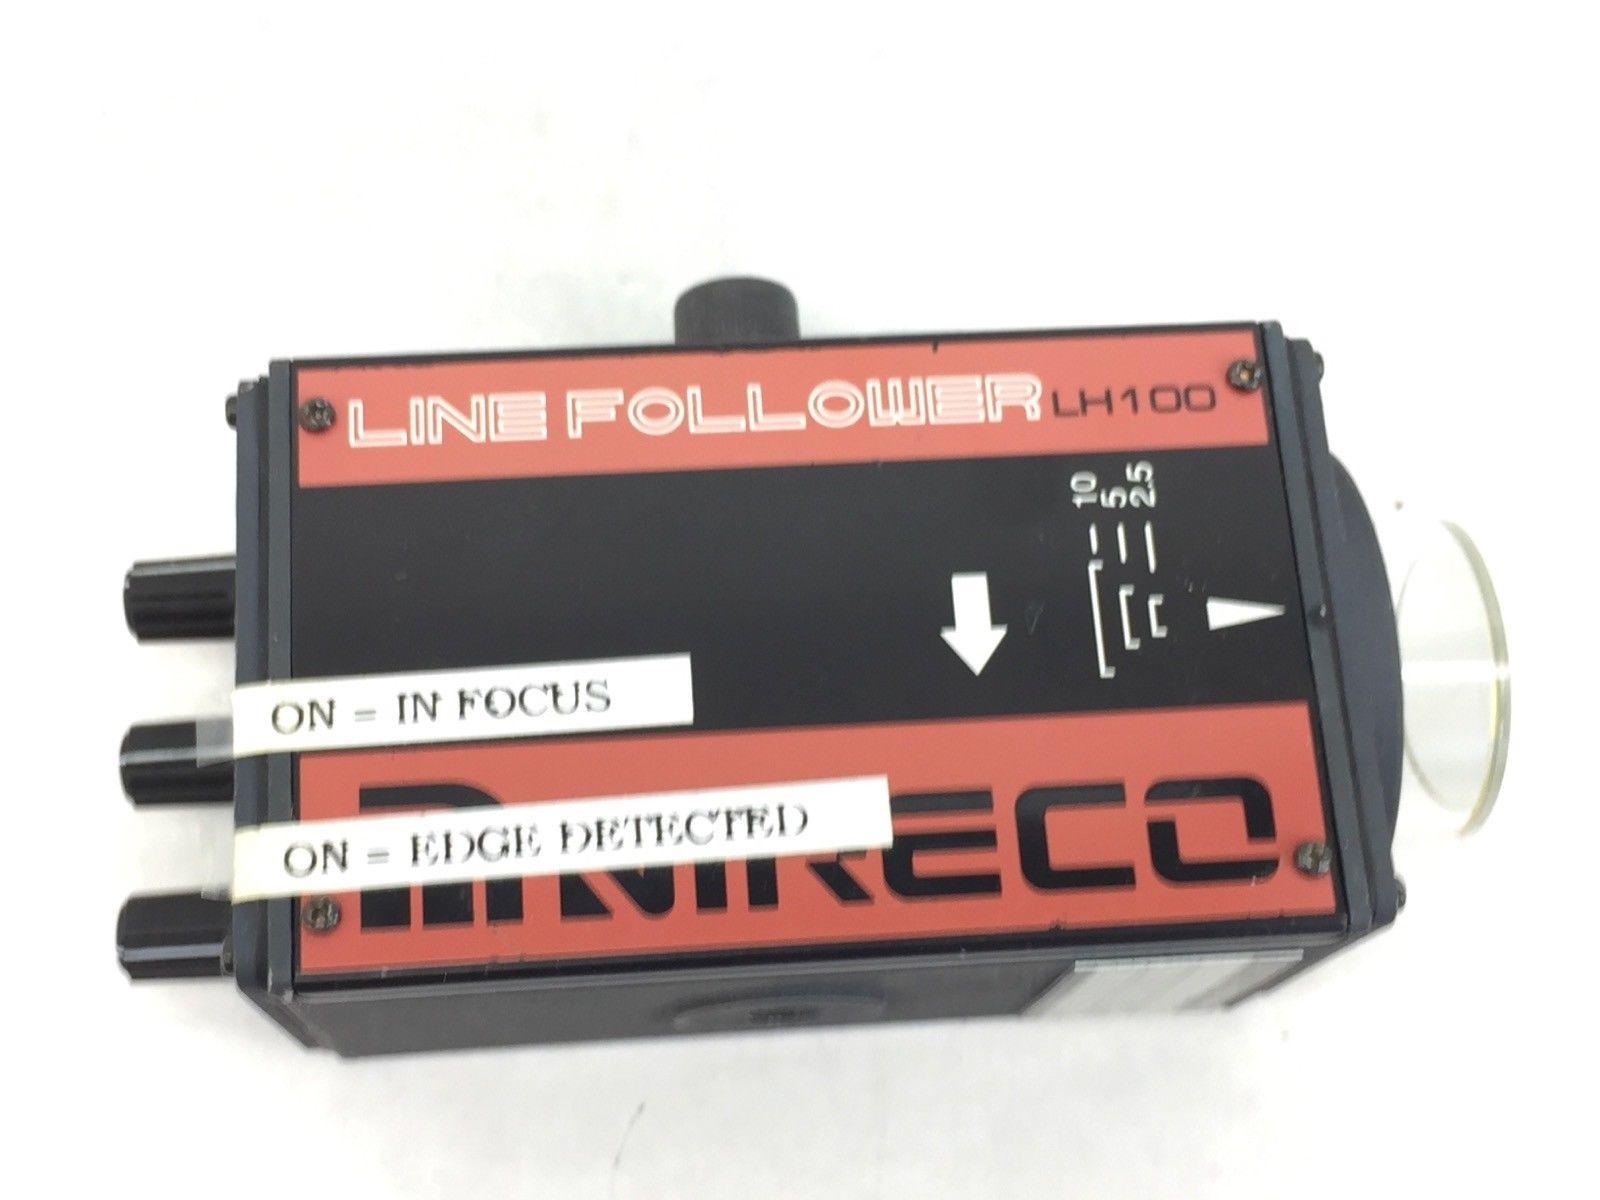 NIRECO LINE FOLLOWER HEAD LH100 (H296) 2